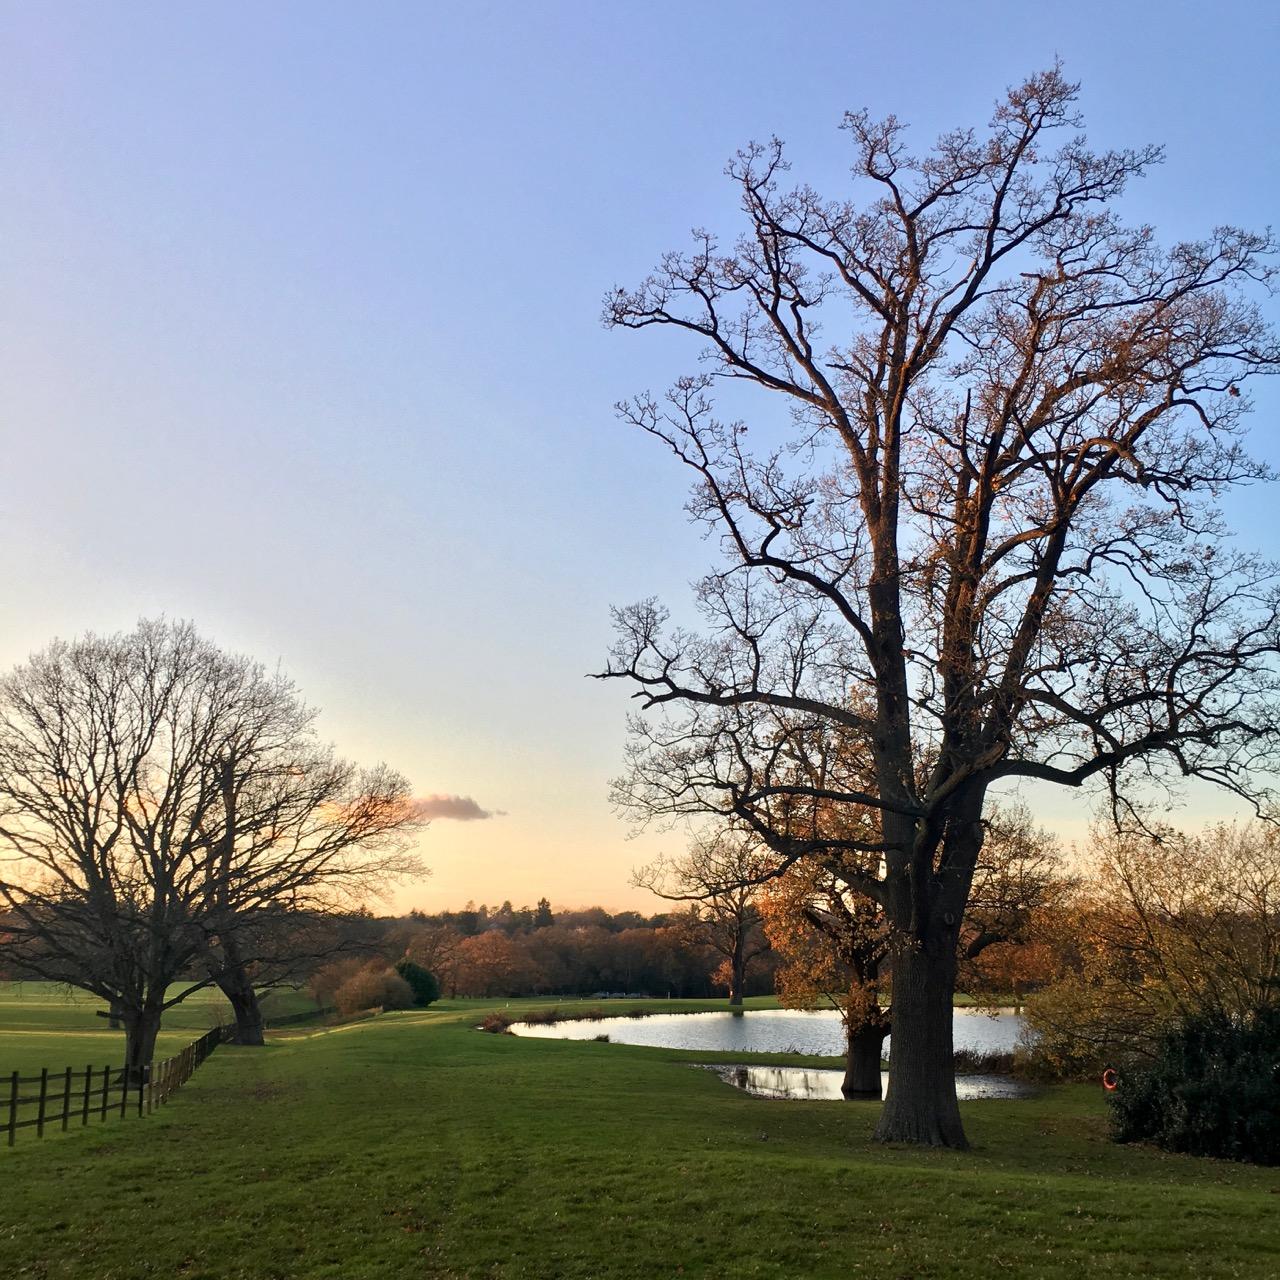 Ascot countryside sunset, England